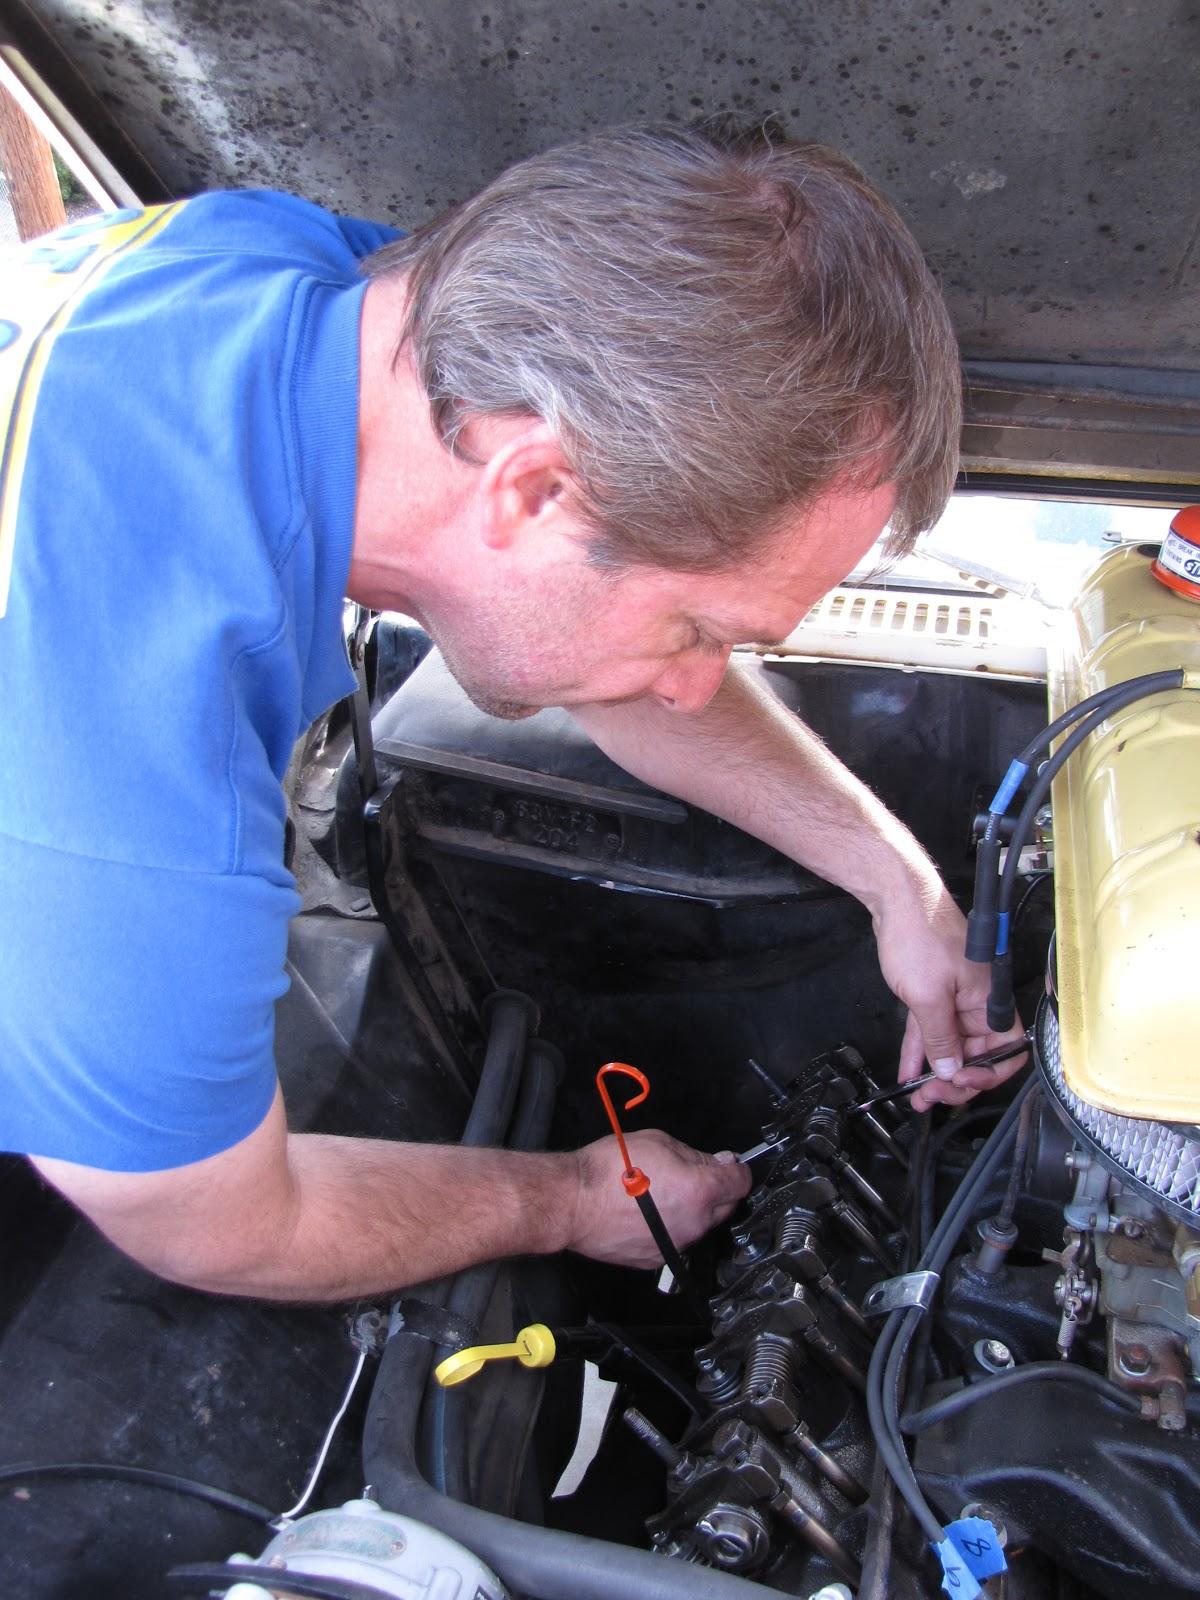 Sensational Studebaker V8 Spark Plug Wiring Diagram V8 Cylinder Diagram V8 Wiring 101 Bdelwellnesstrialsorg